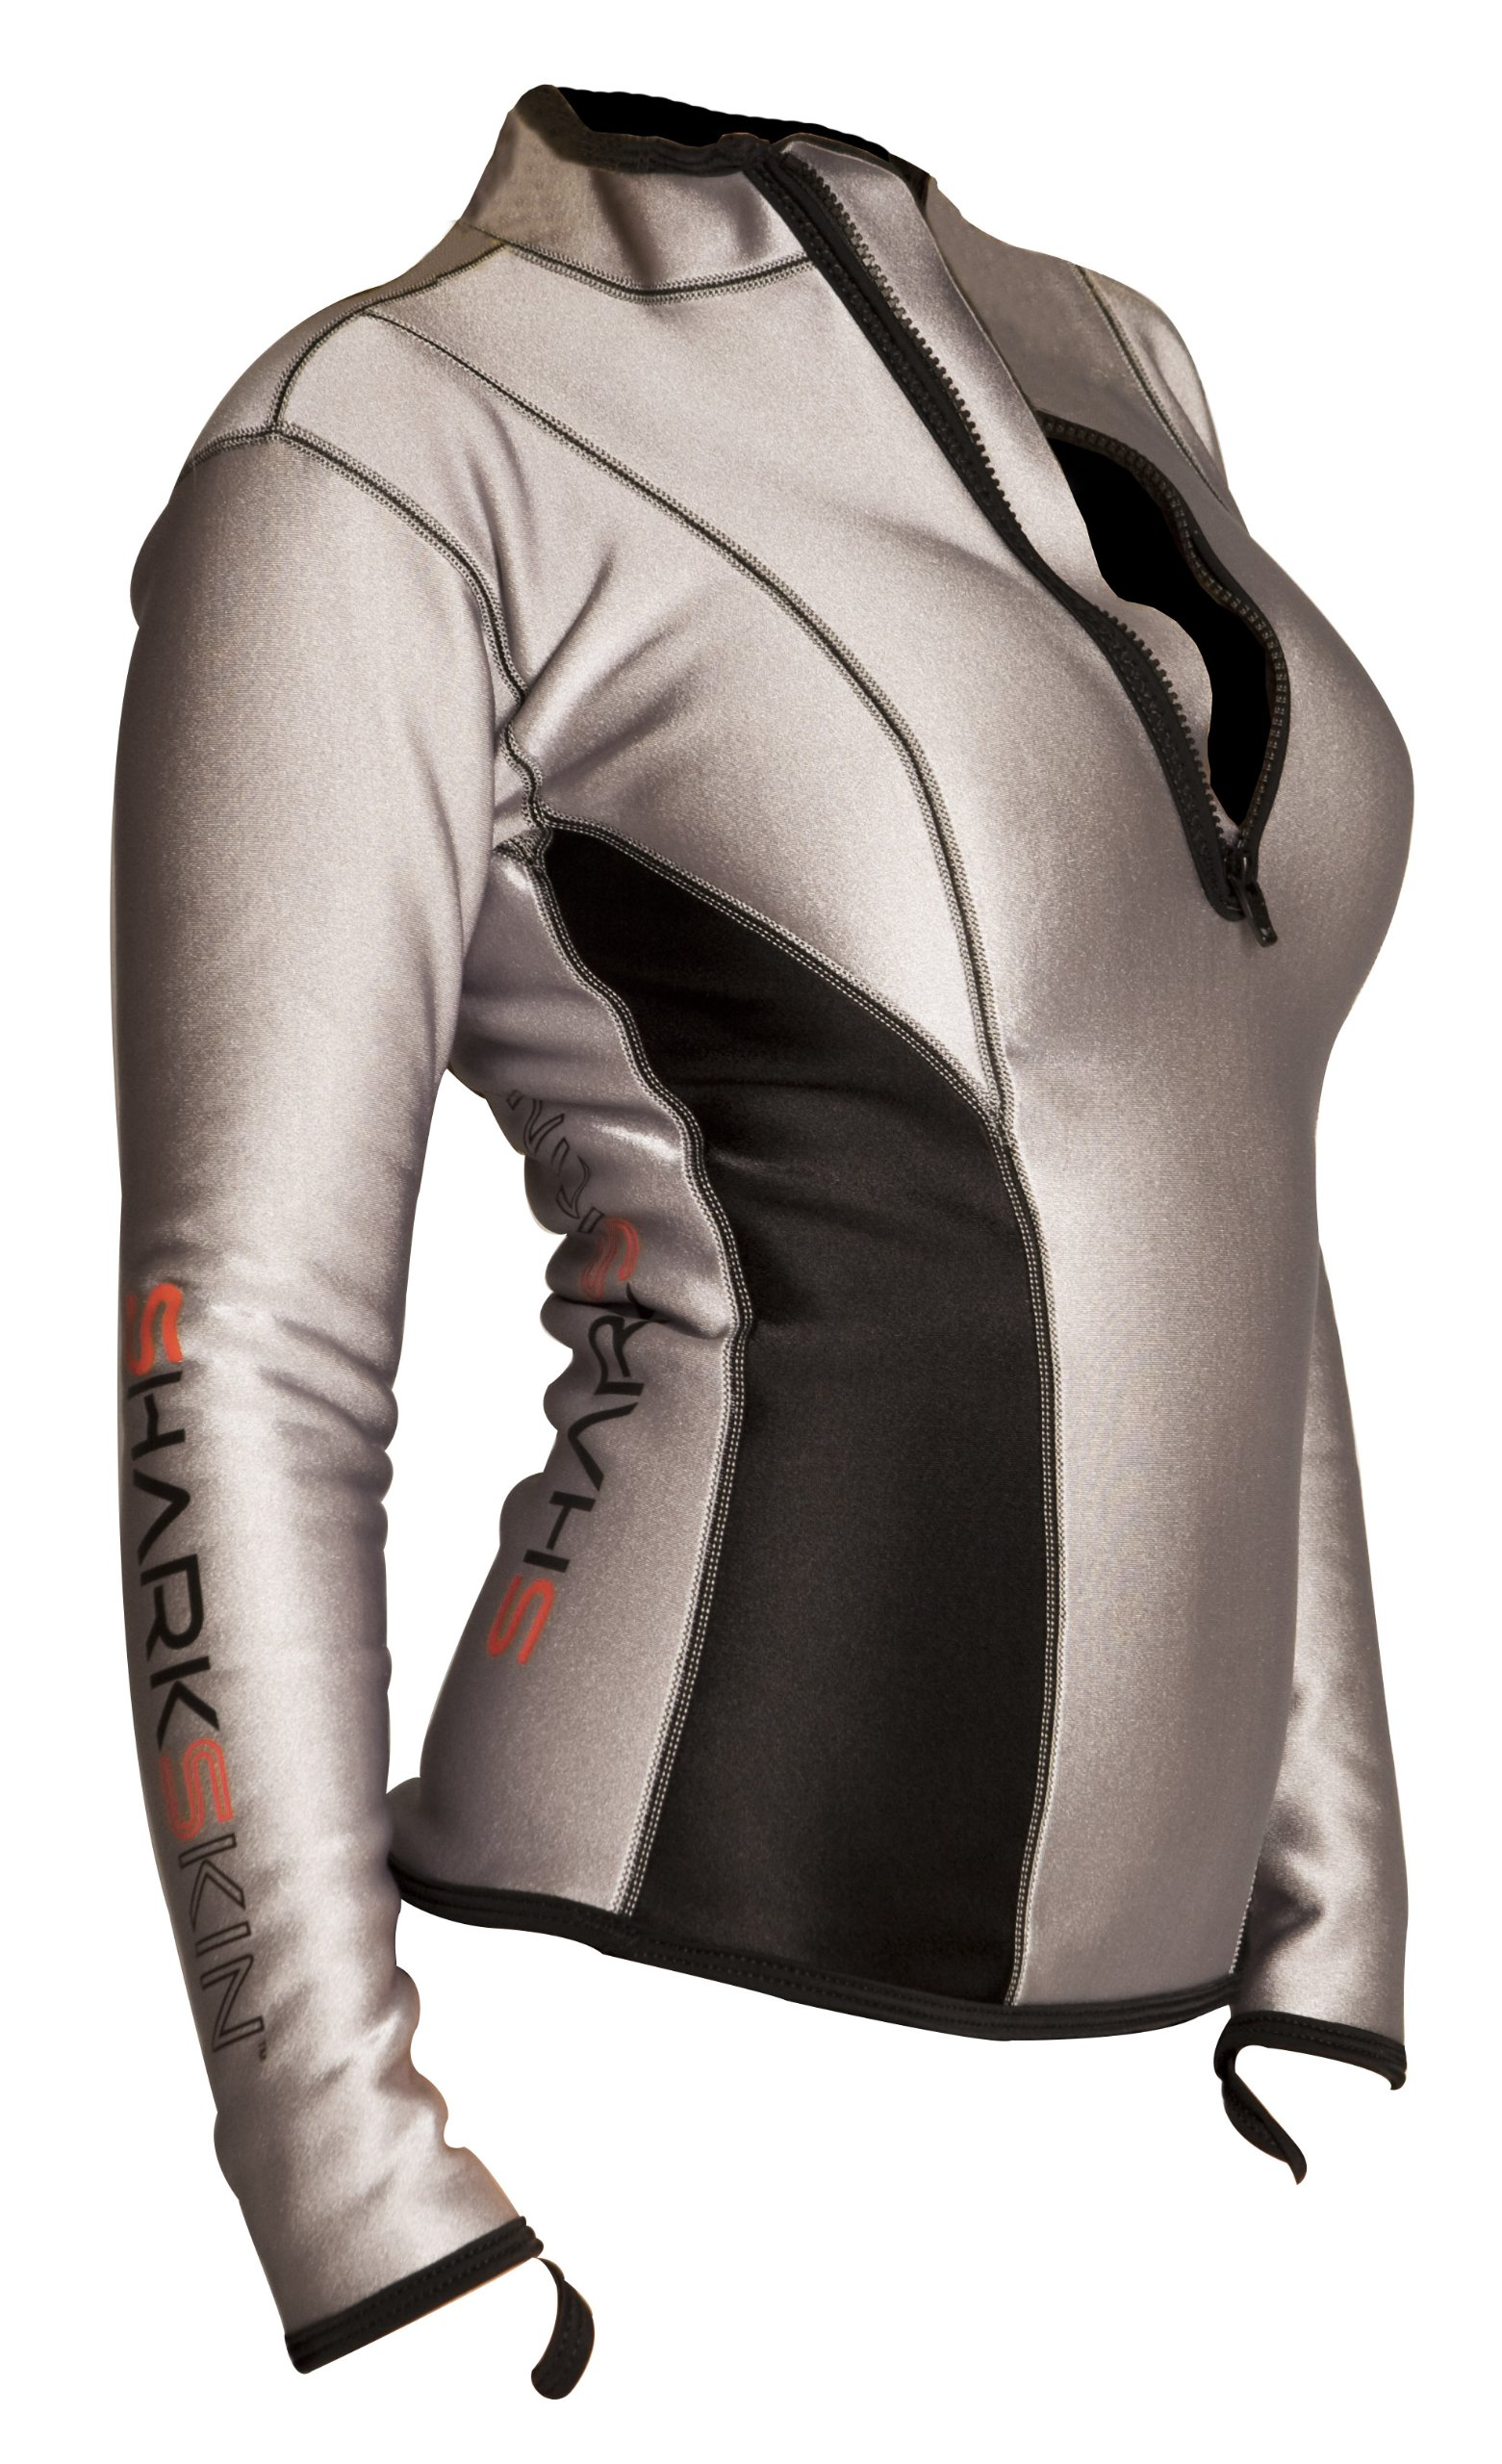 Sharkskin Women's Chillproof Climate Control Long Sleeve Shirt, Size 8